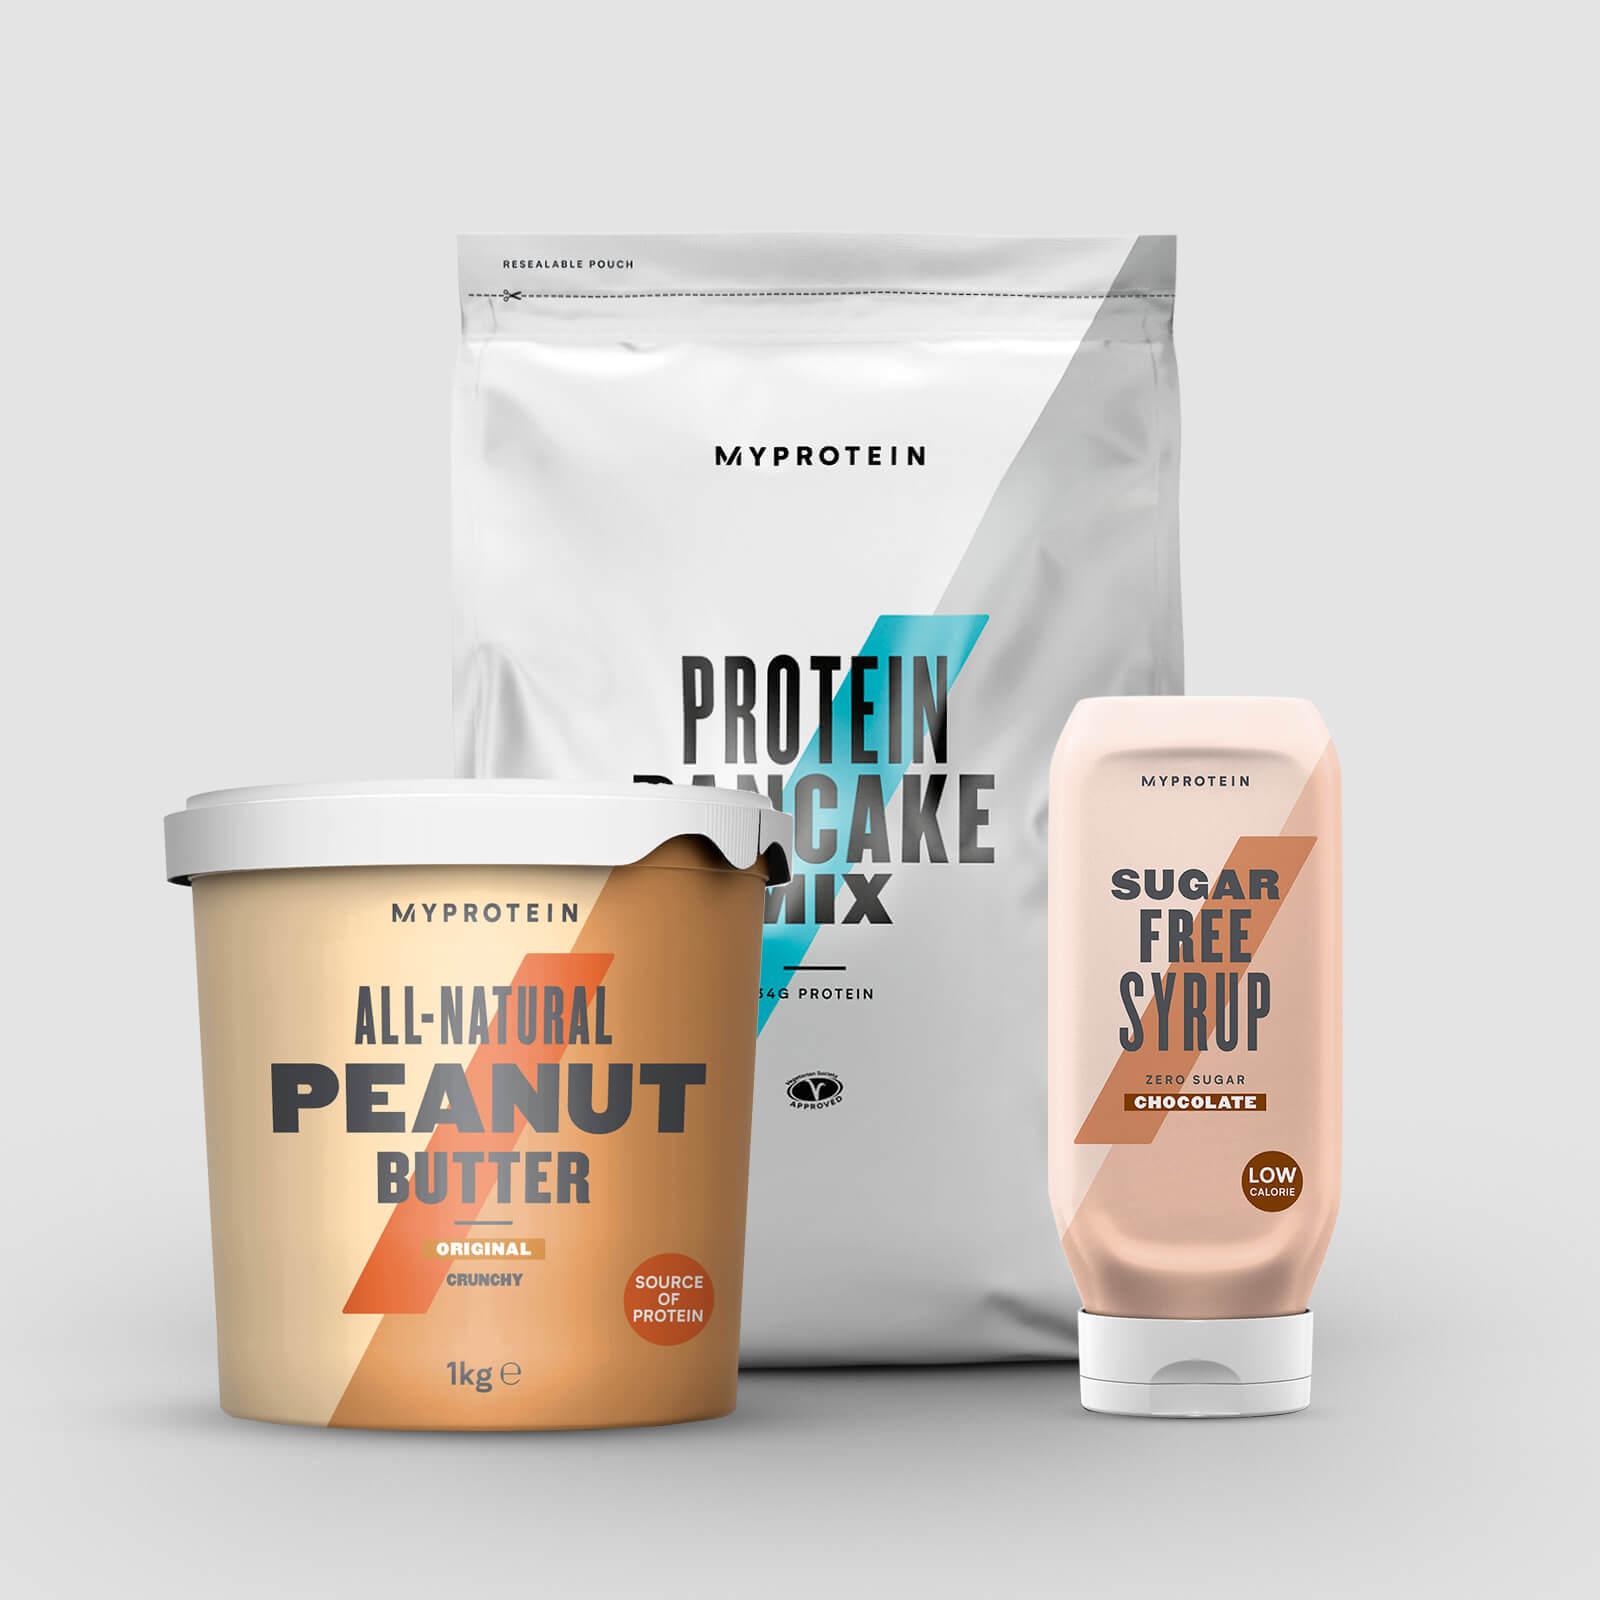 Pack pour Pancake Protéiné - Pancake Mix - Maple Syrup - Syrup - Chocolate